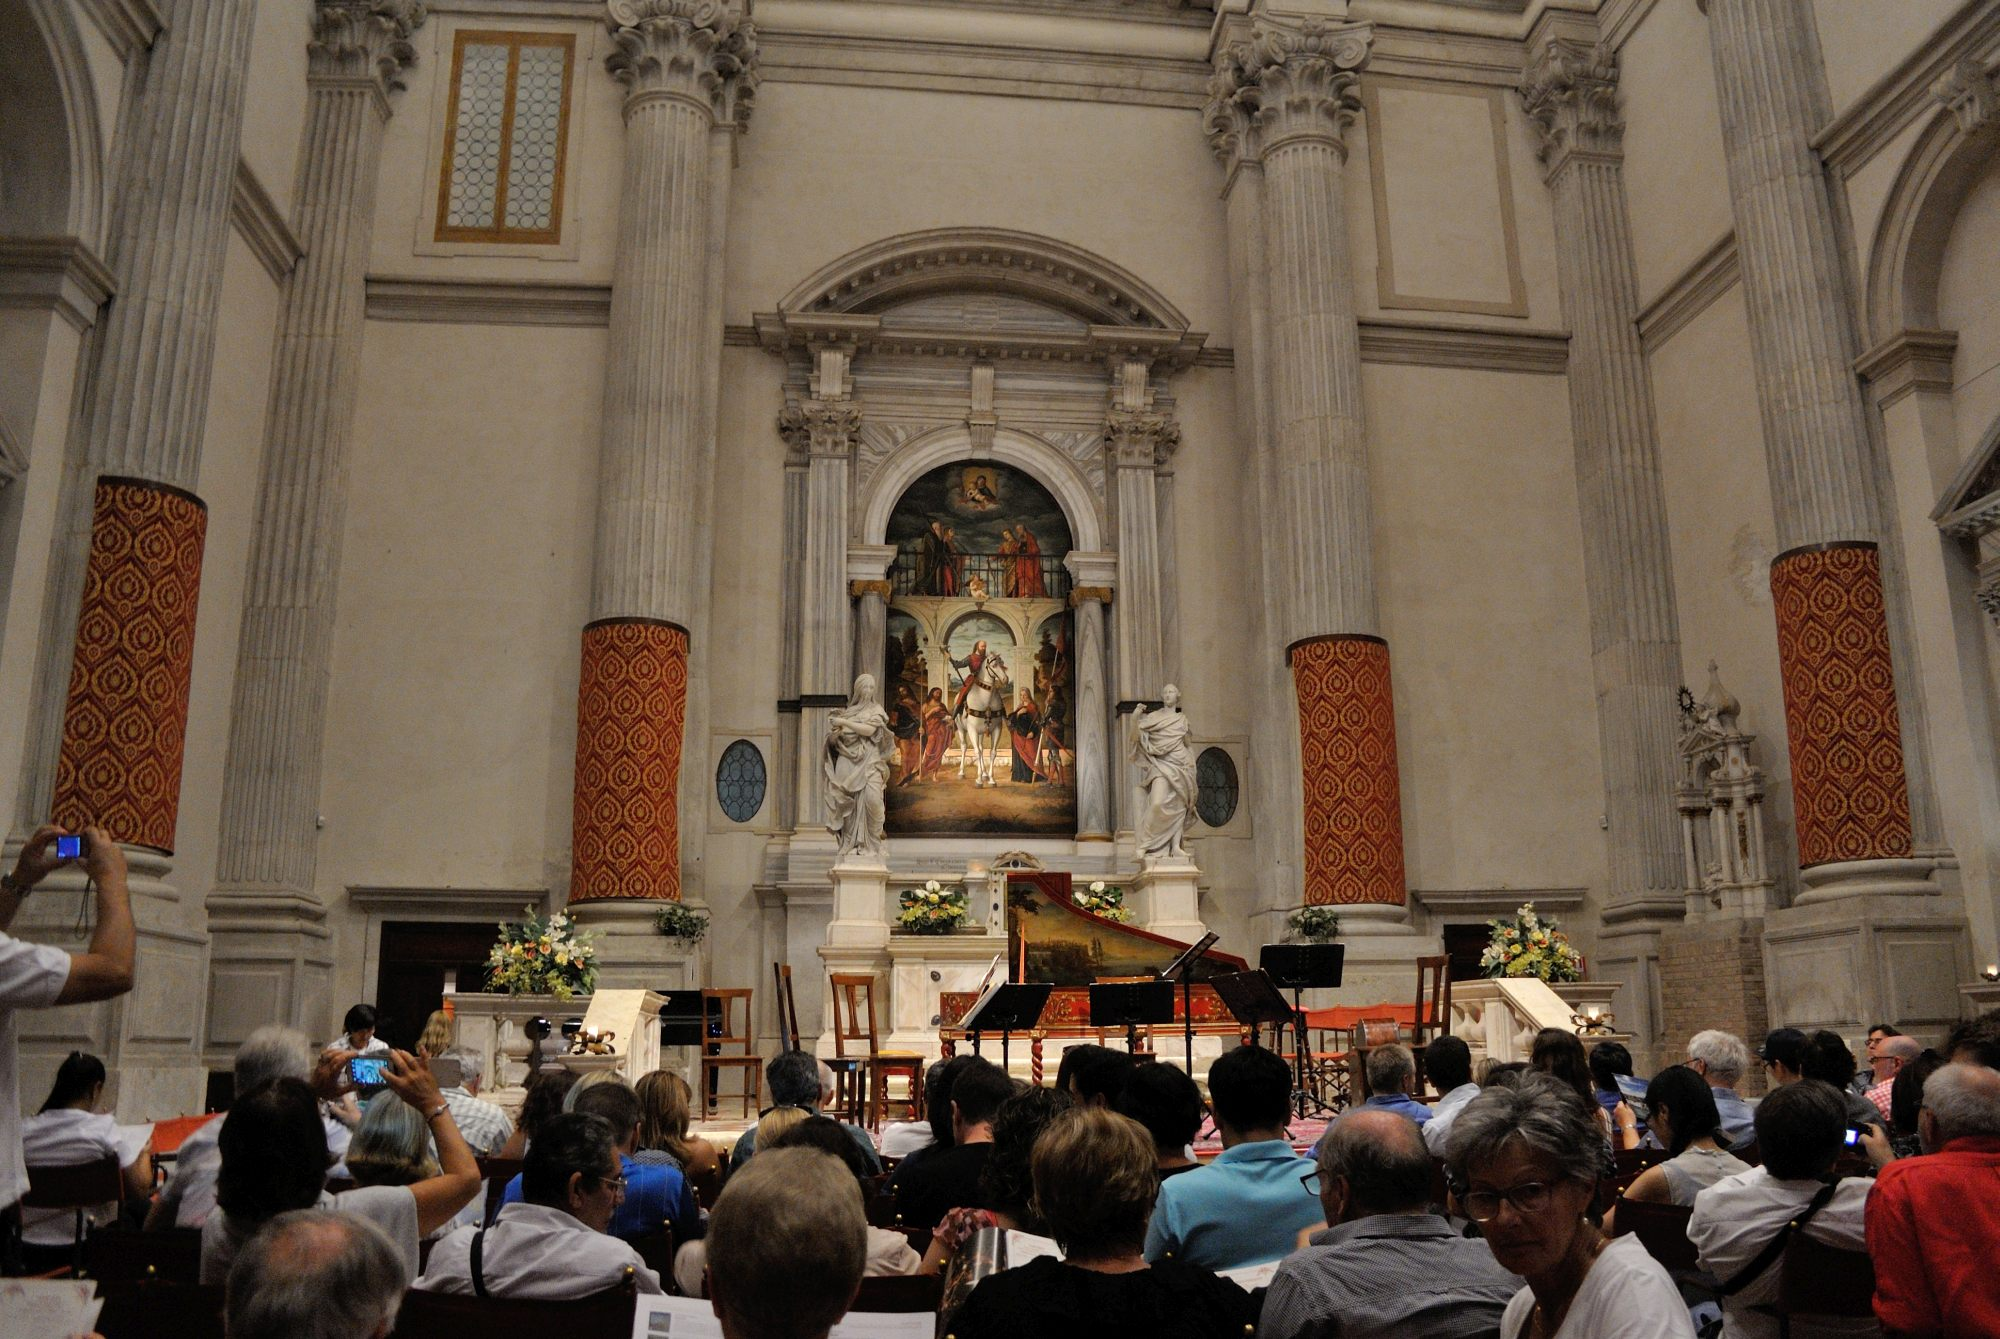 The interior of San Vidal.